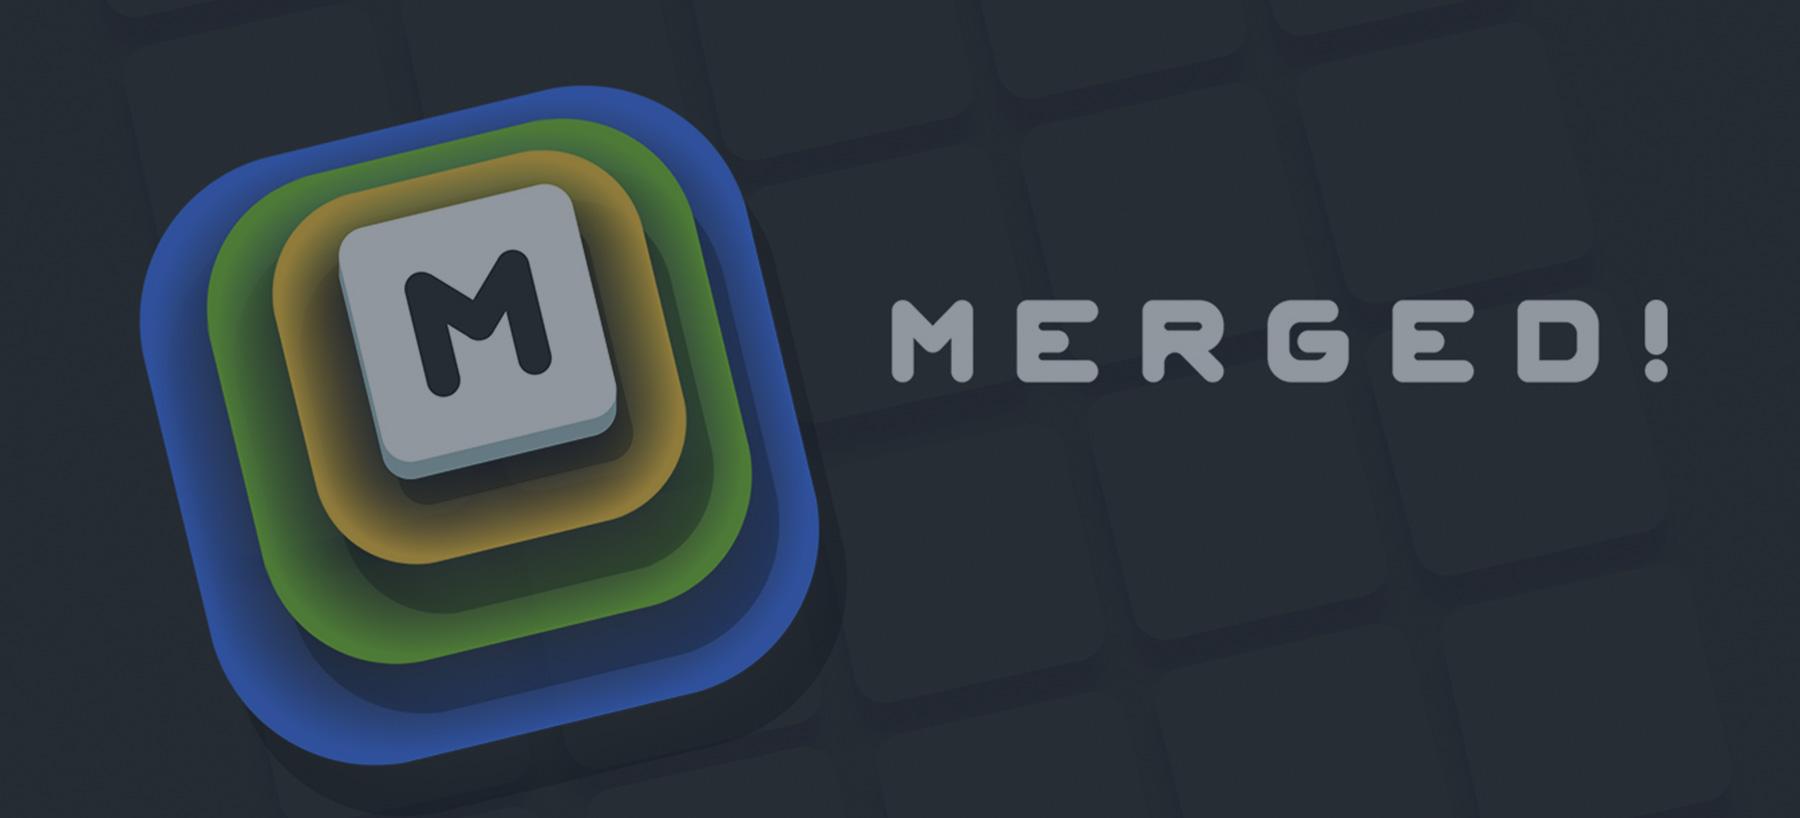 Merged! Hero Image